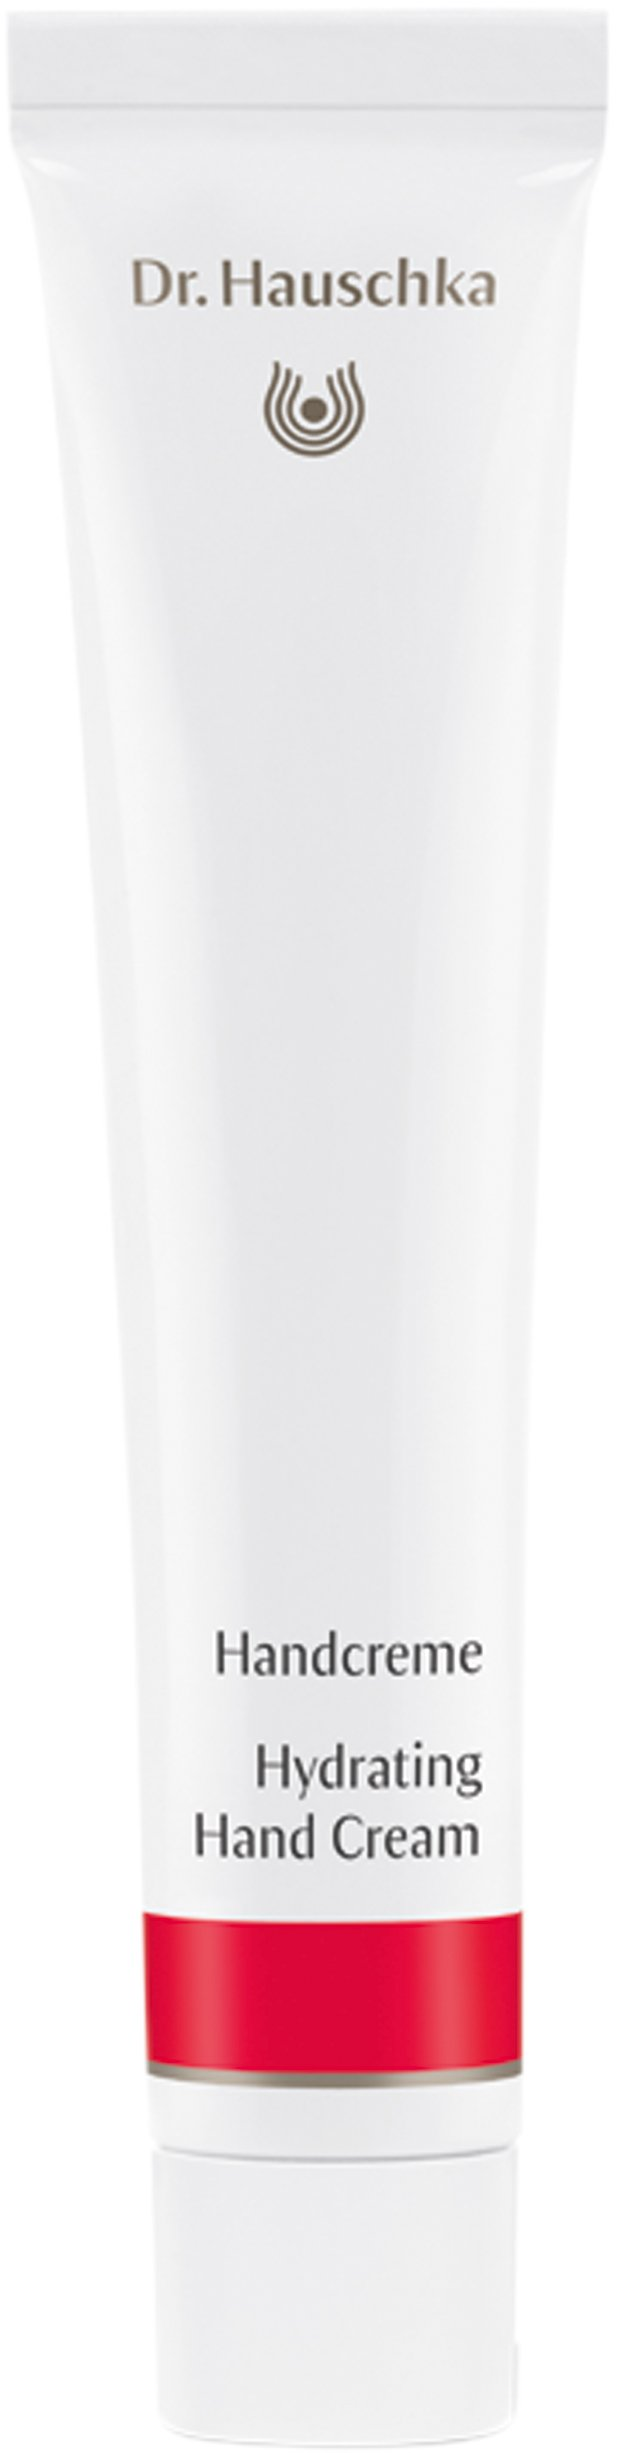 Dr. Hauschka - Hydrating Hand Cream 50 ml